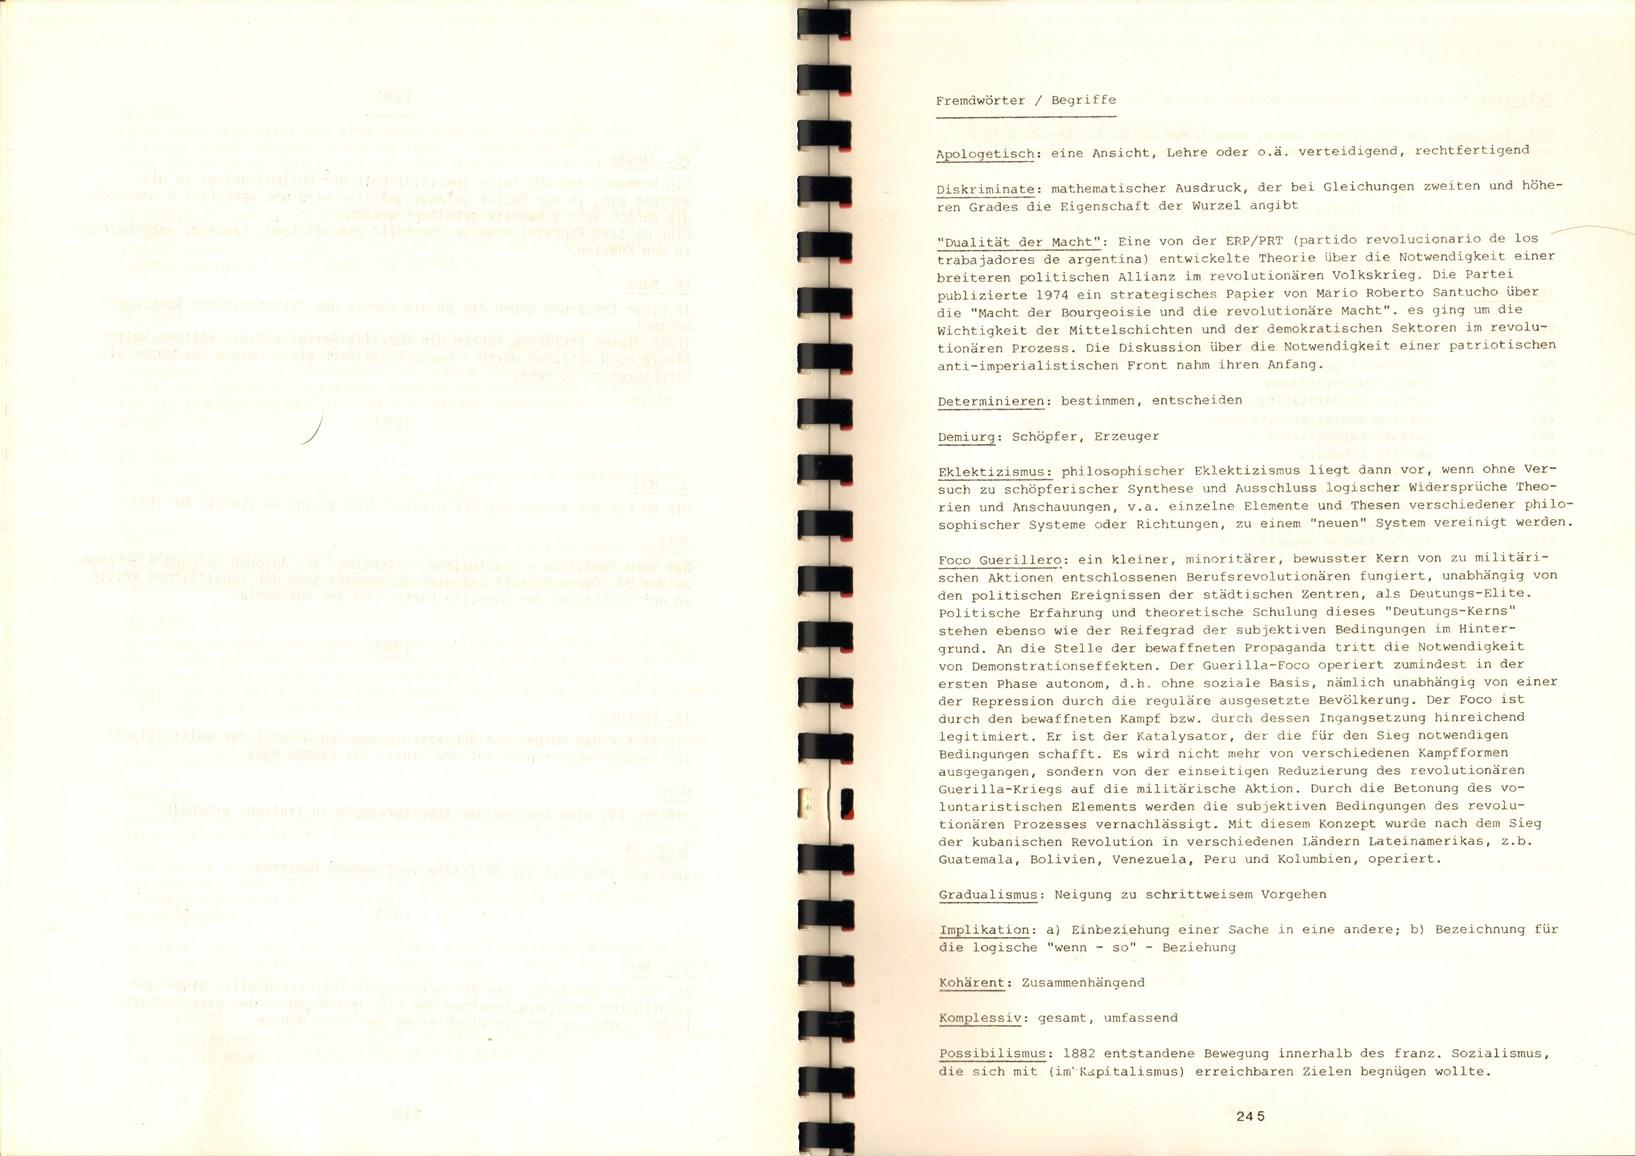 Internationale_Debatte_1985_Brigate_Rosse_123